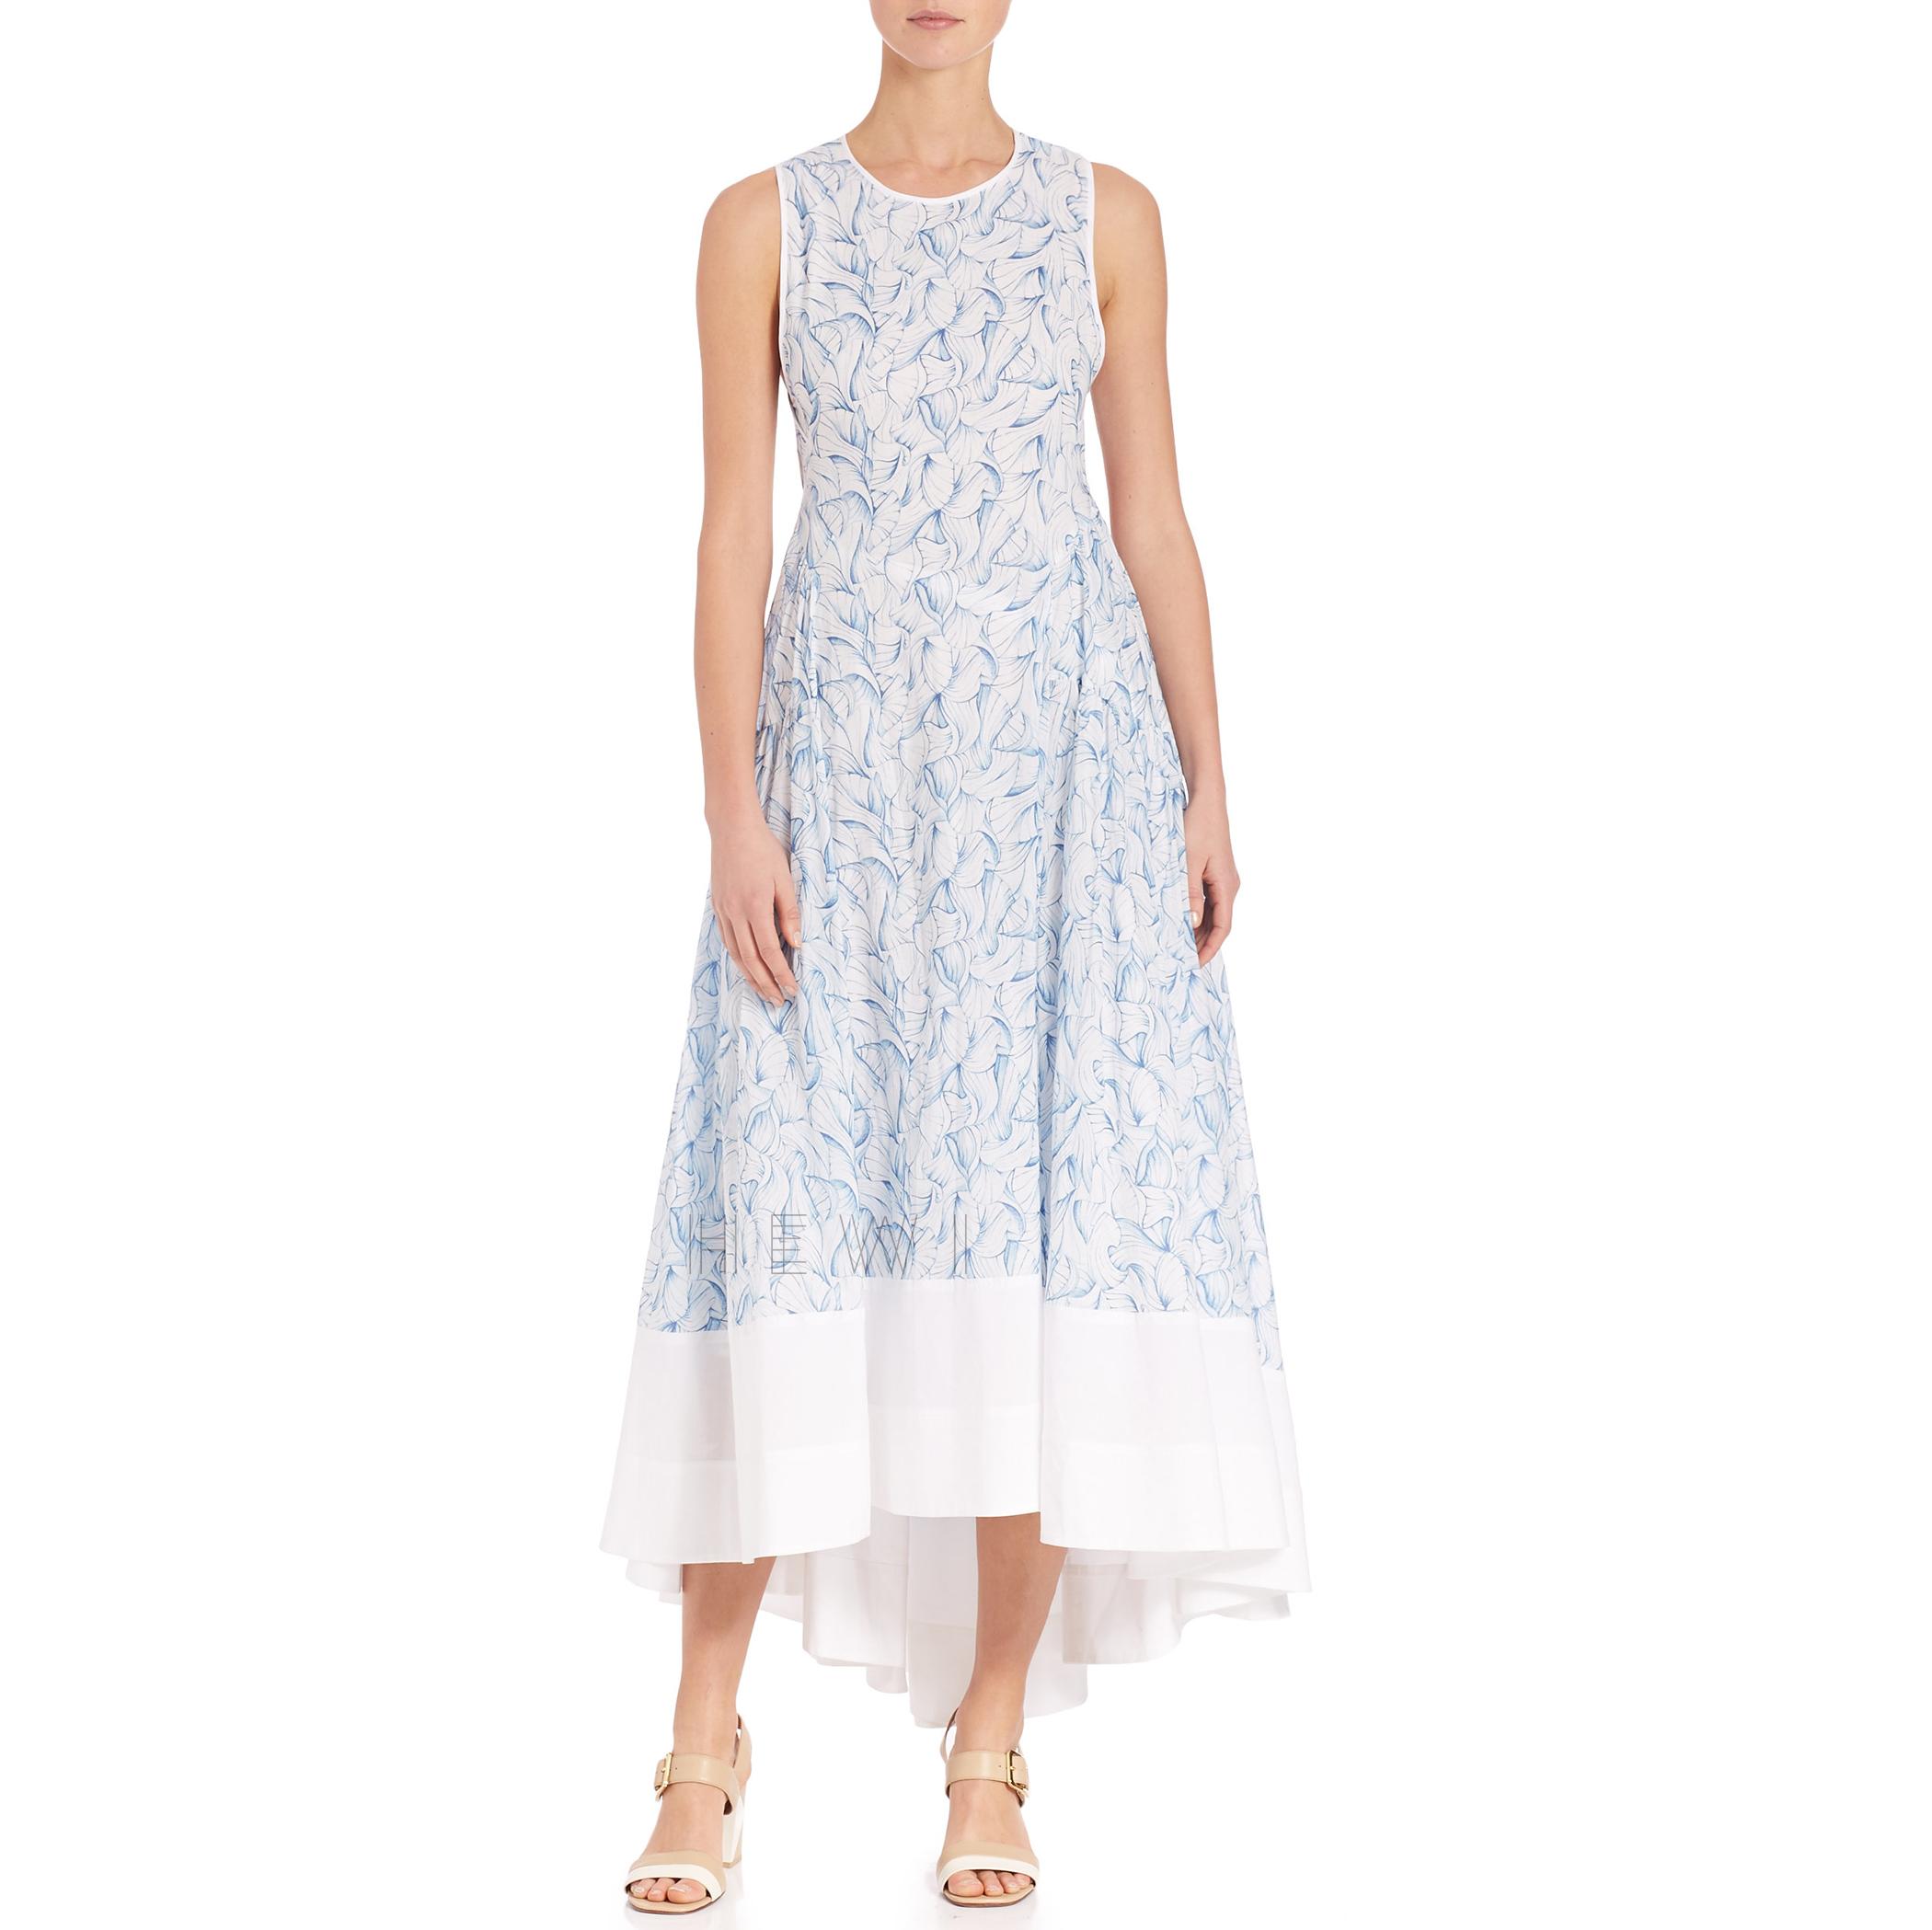 Tory Burch Blue Blaire Printed Cotton Dress